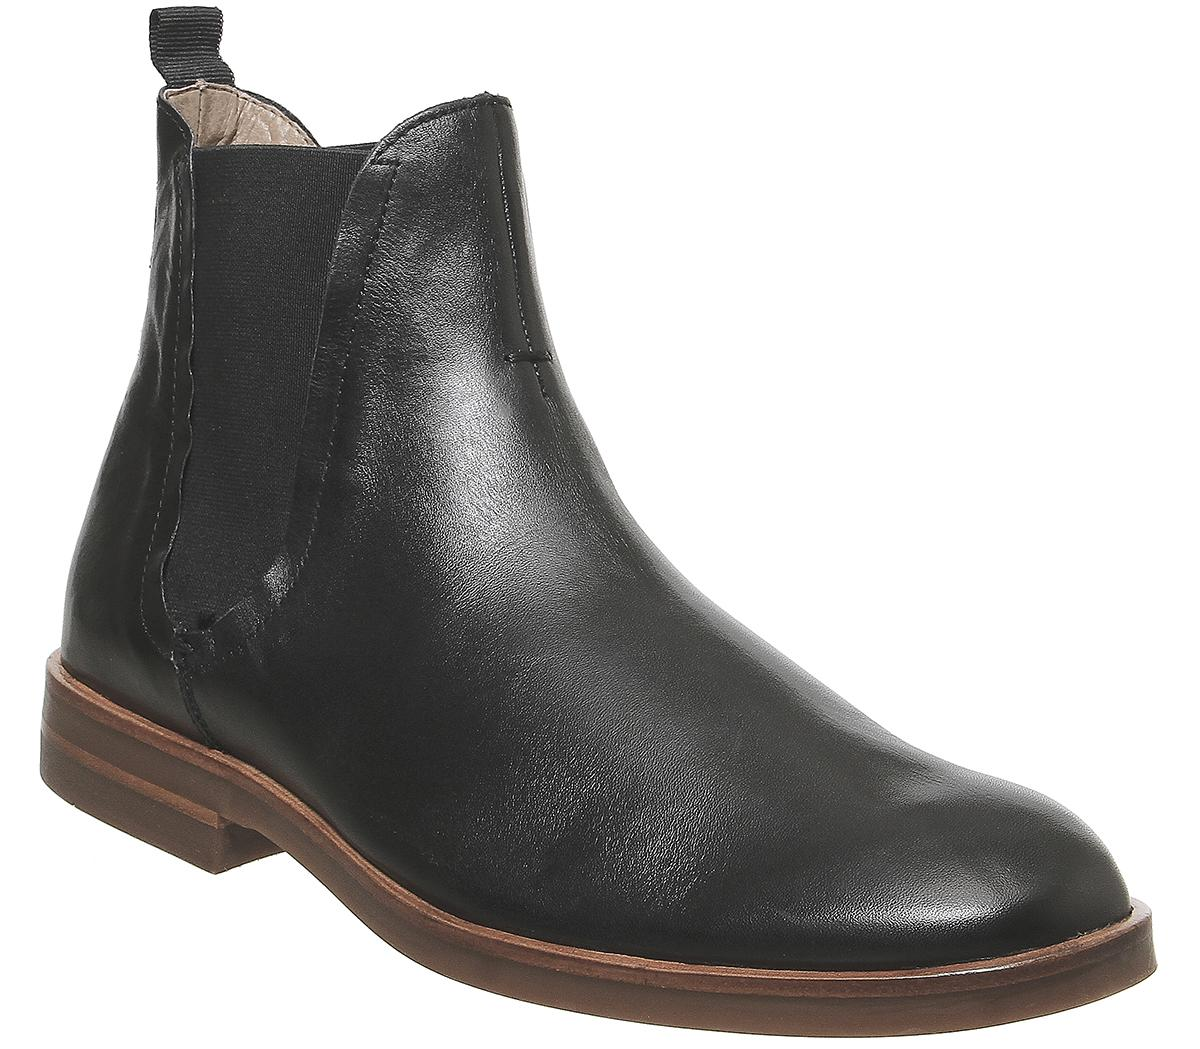 Adlington Chelsea Boot